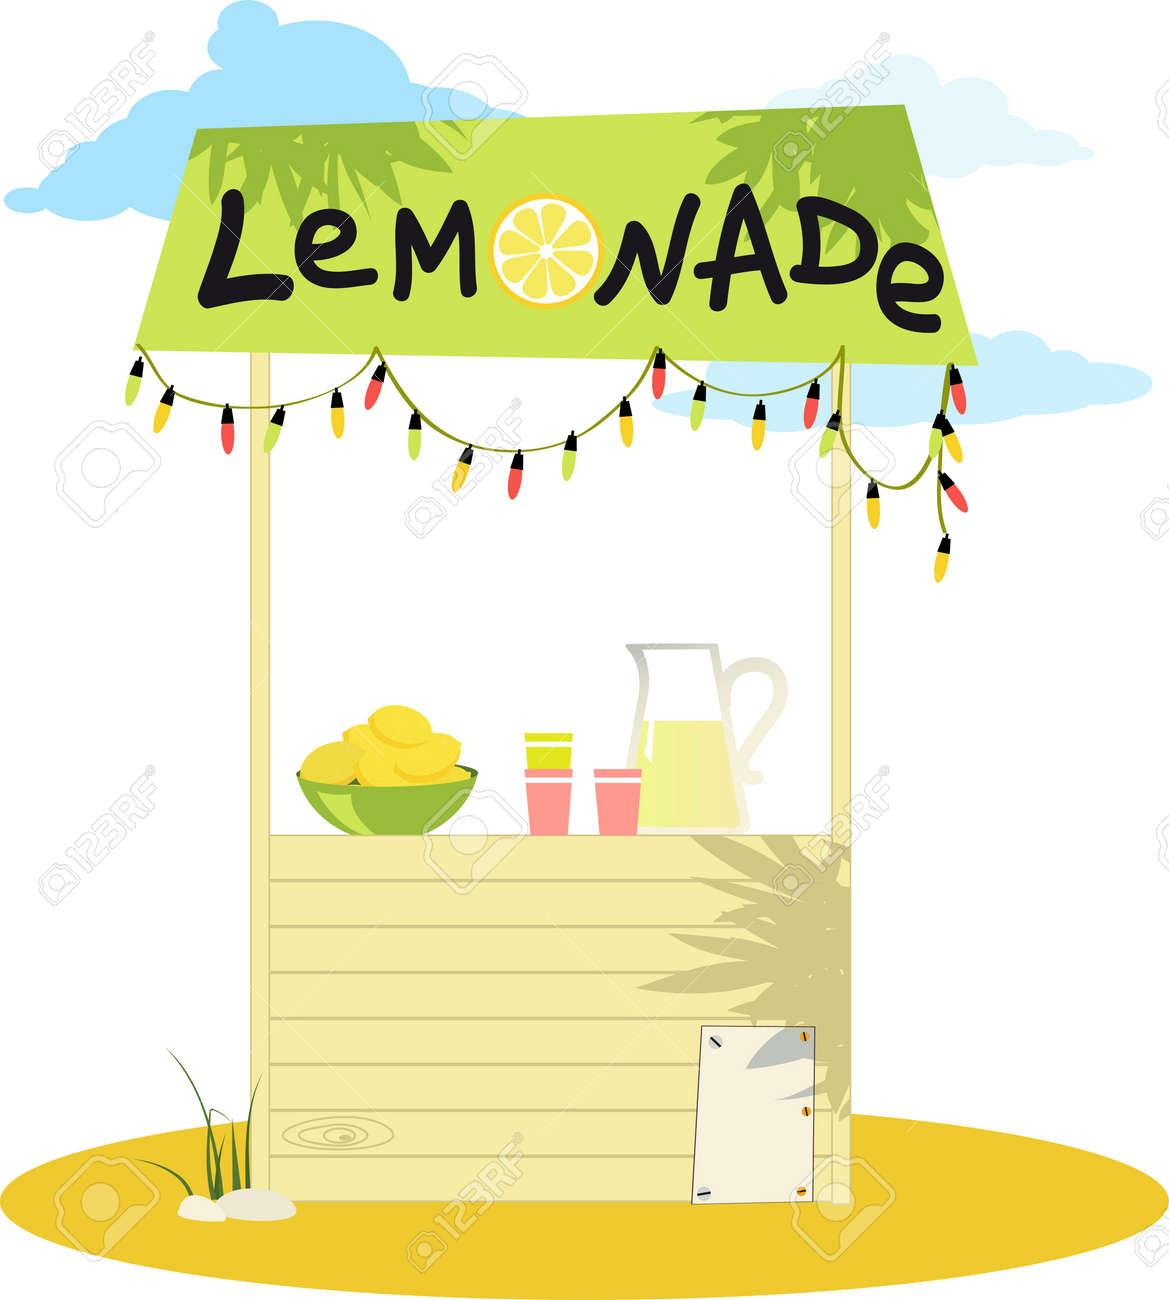 Cartoon lemonade stand with fresh lemons and a pitcher - 67300157